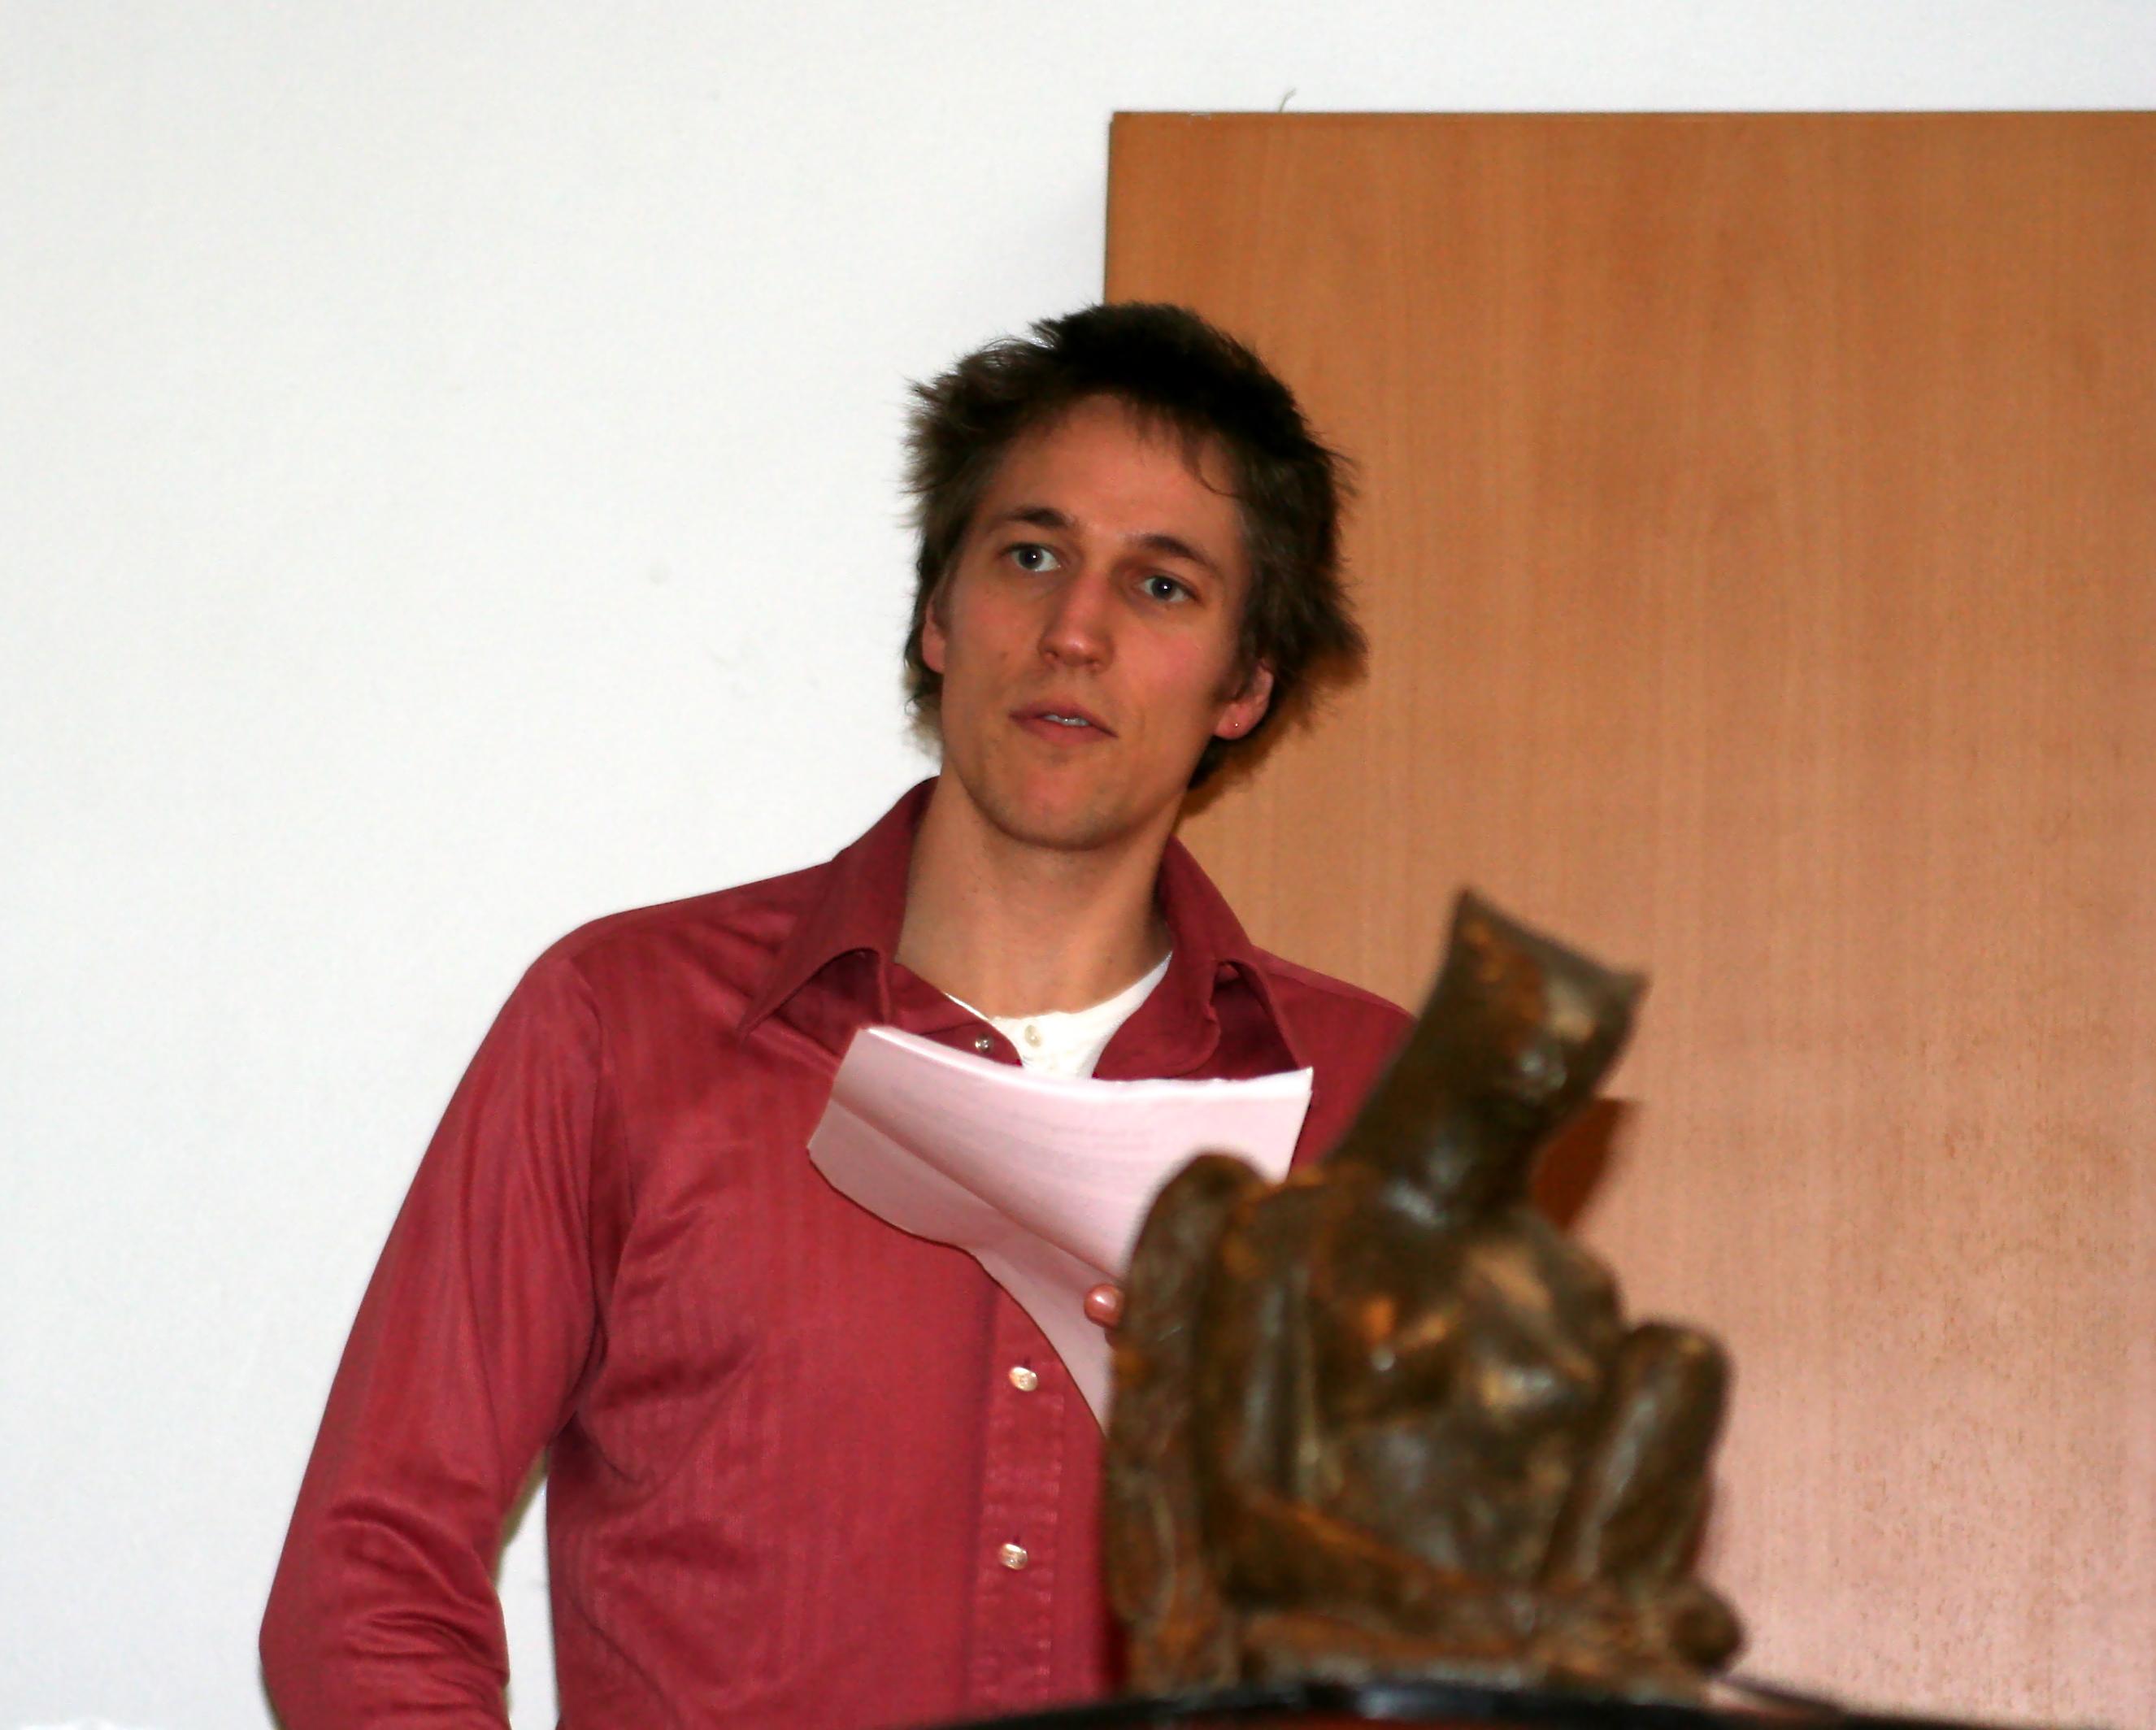 Christian Lollike takker for Kafkatten.